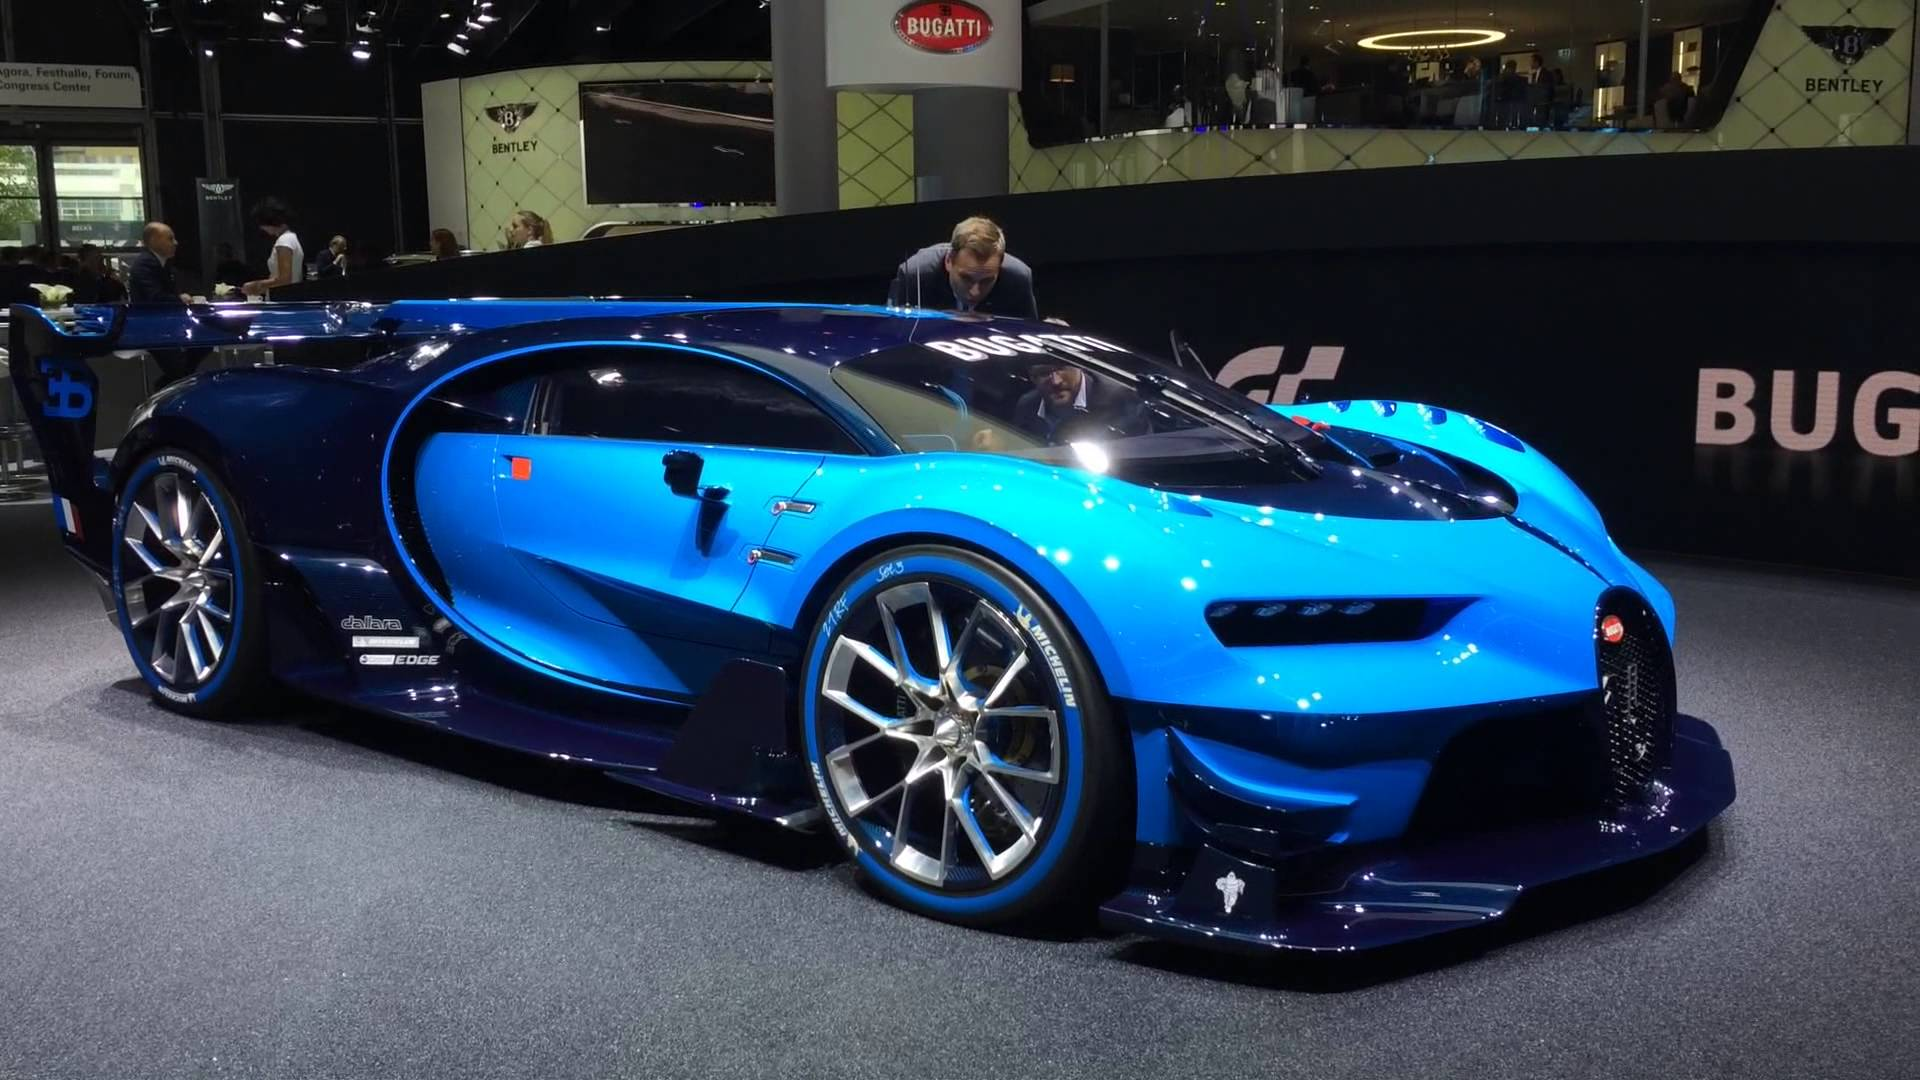 Floyd Mayweather Pays $35 Million For The 2017 Bugatti Chiron